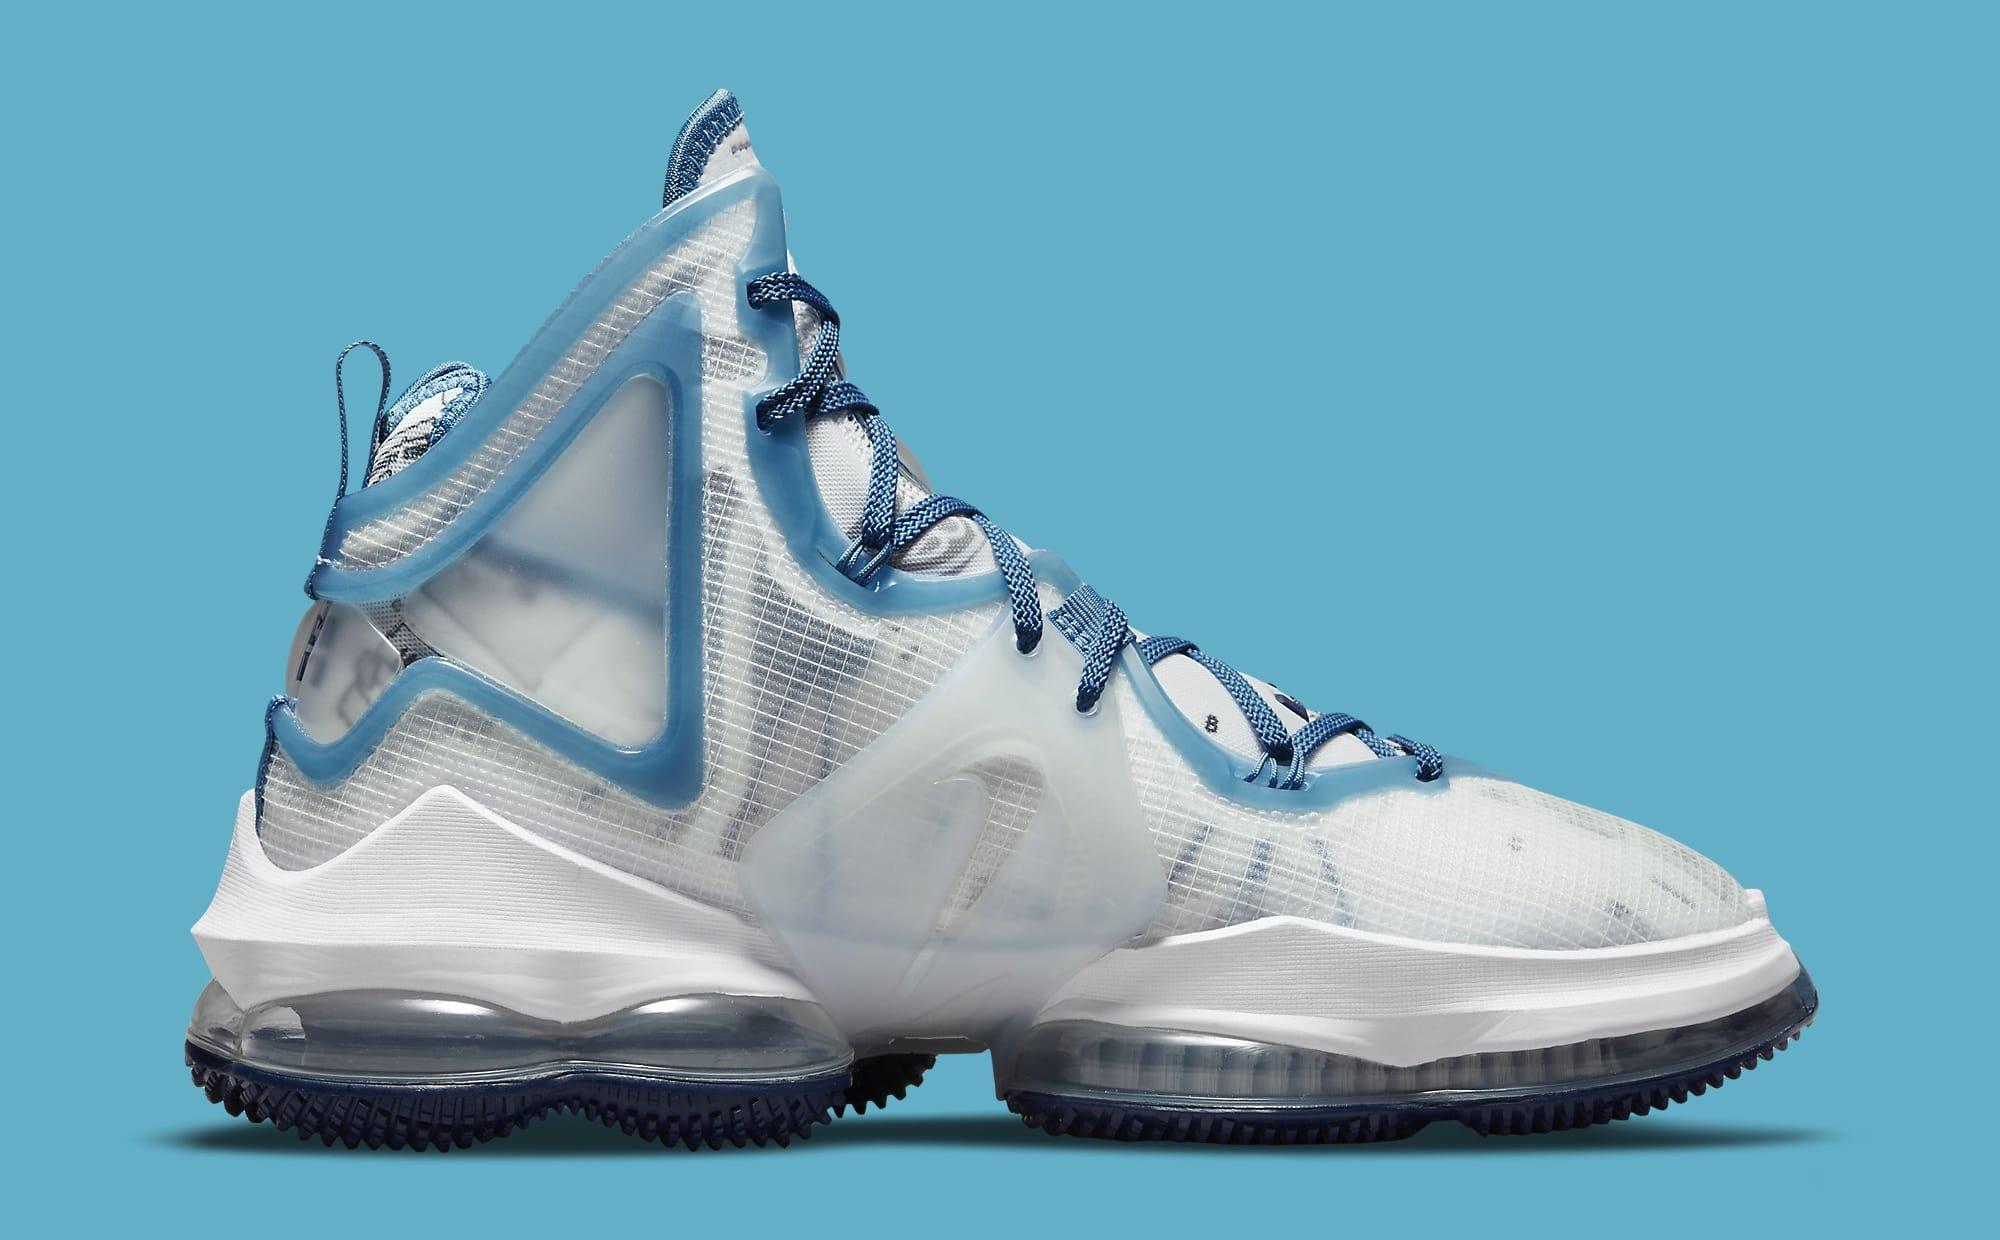 Nike LeBron 19 'Space Jam' DC9338-100 Medial